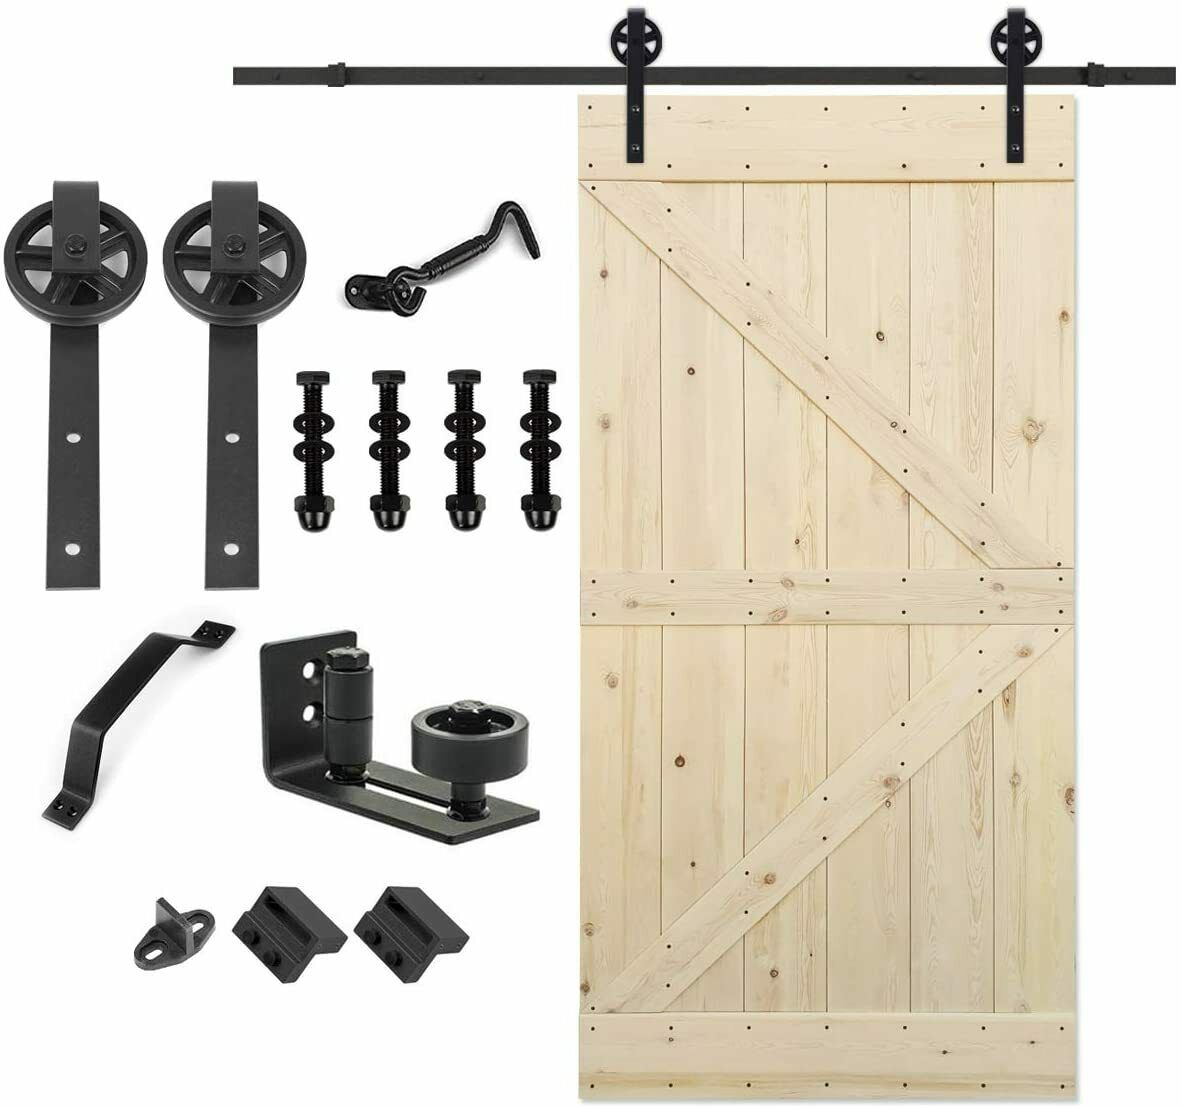 Paneled Wood Unfinished Barn Door With Installation Hardware Kit For Sale Online Ebay